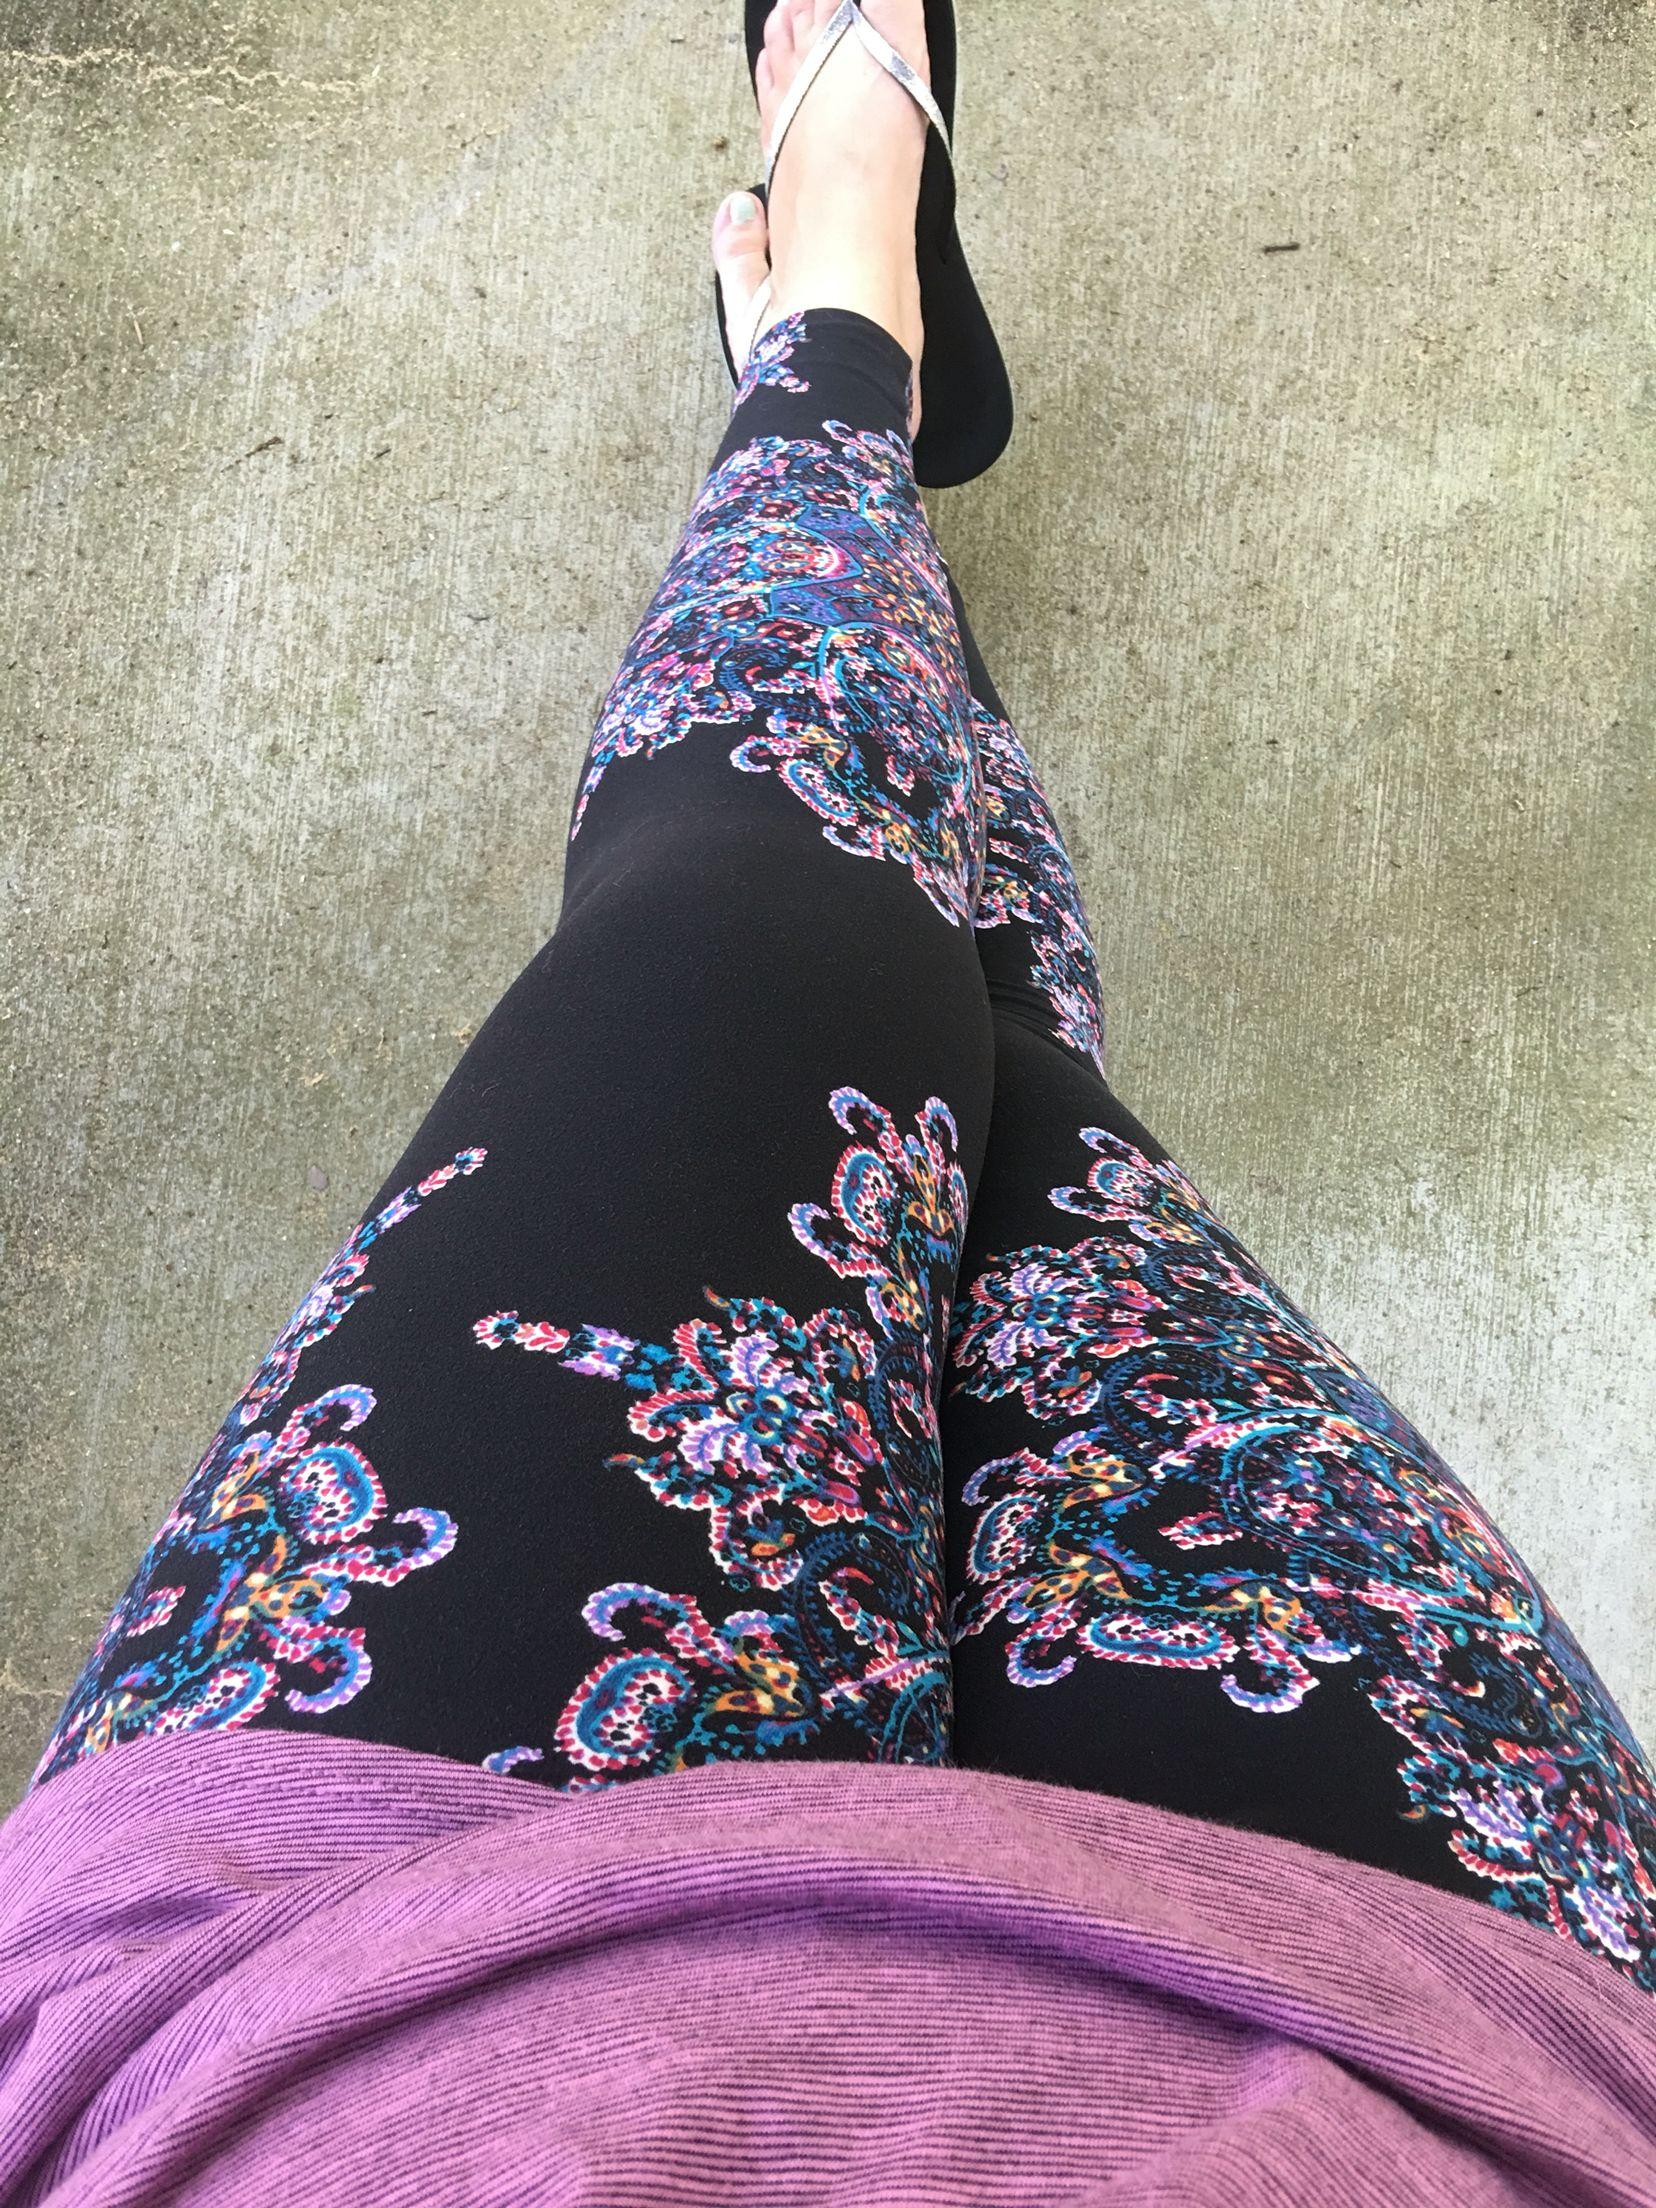 LuLaRoe unicorn leggings #lularoe #lularoeleggings # ...